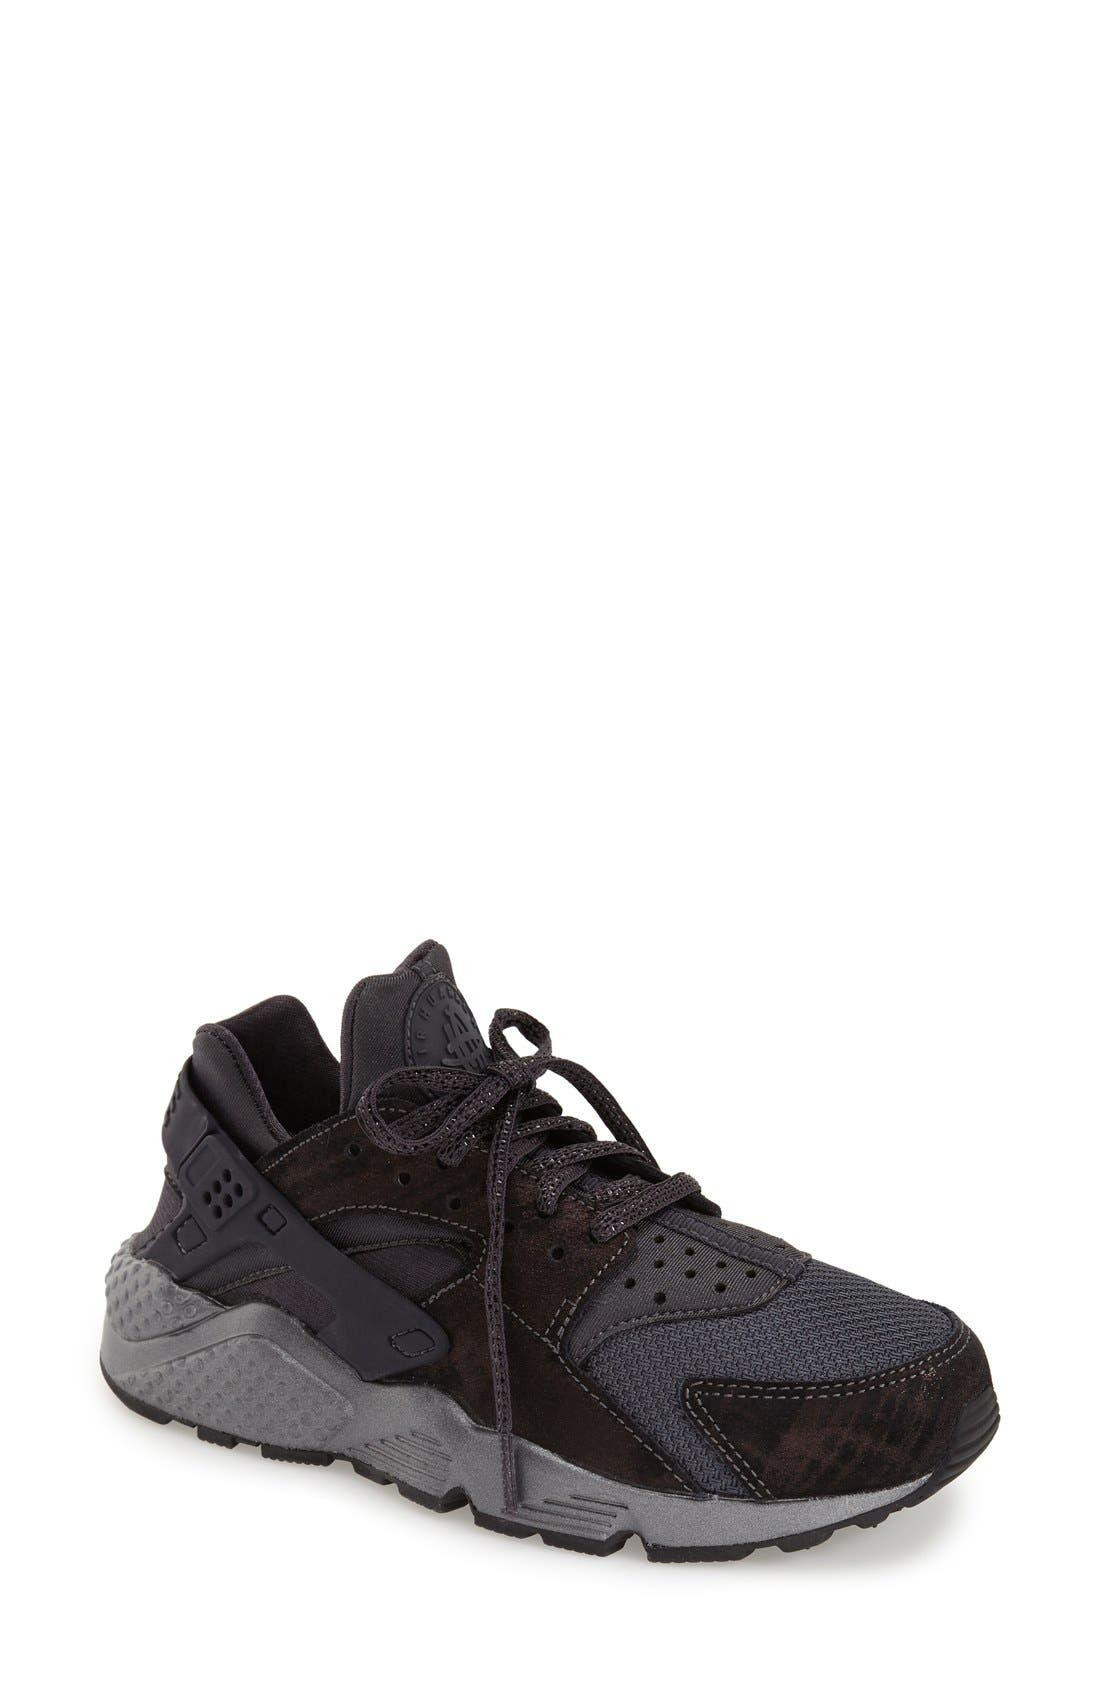 Alternate Image 1 Selected - Nike 'Air Huarache' Sneaker (Women)